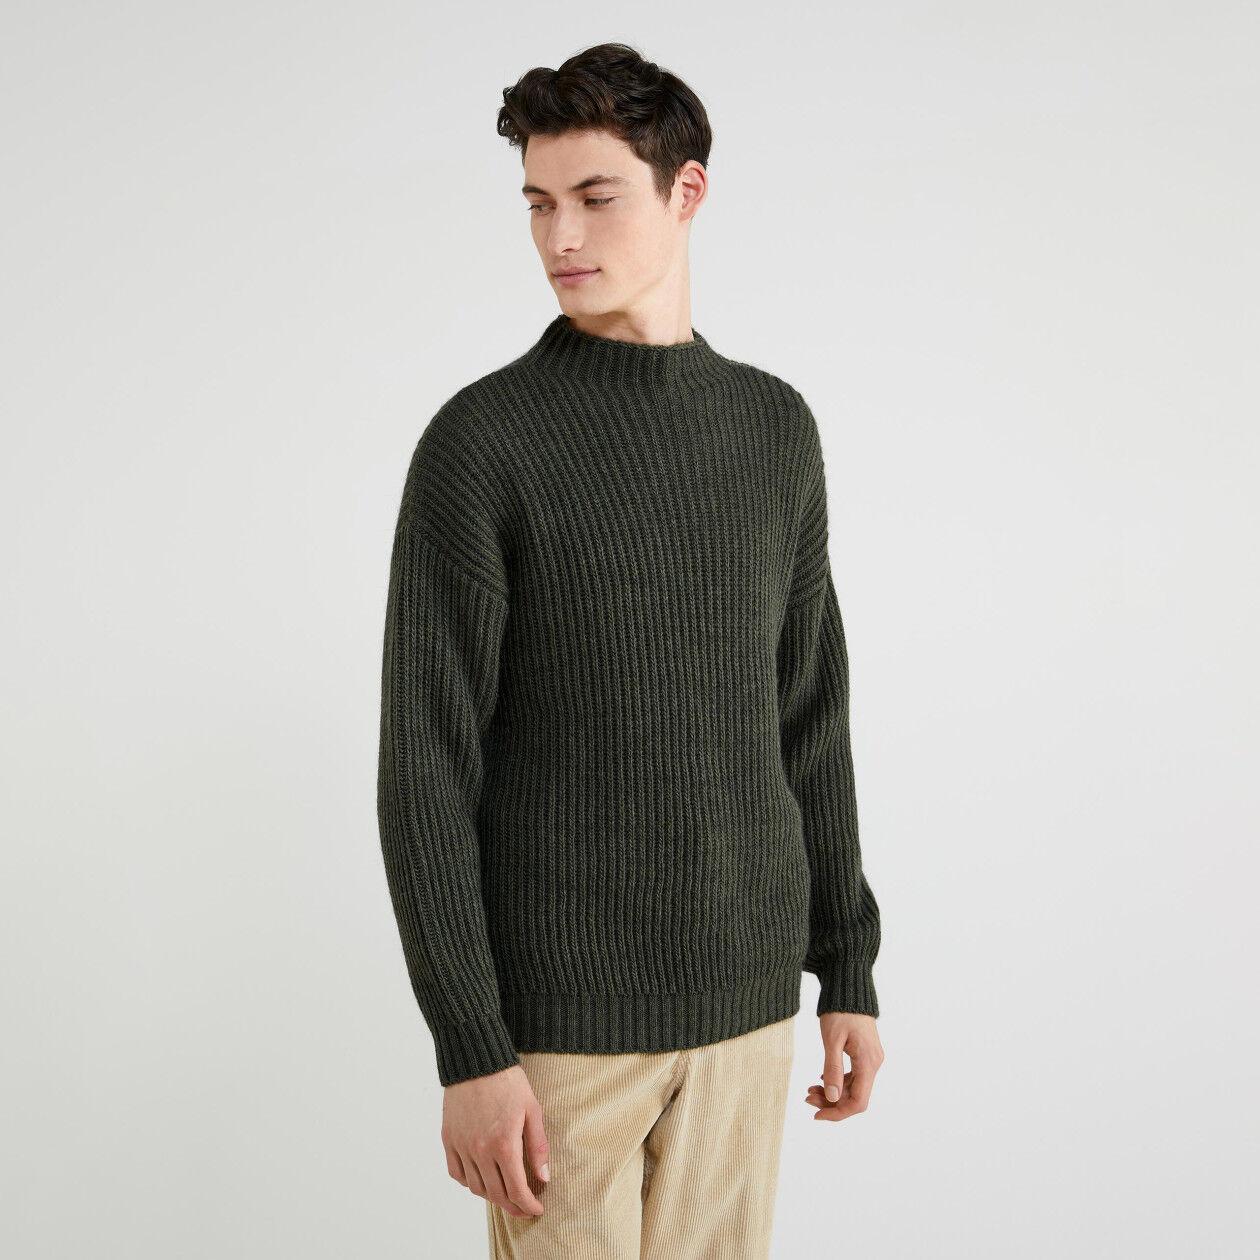 Turtleneck sweater in wool and alpaca